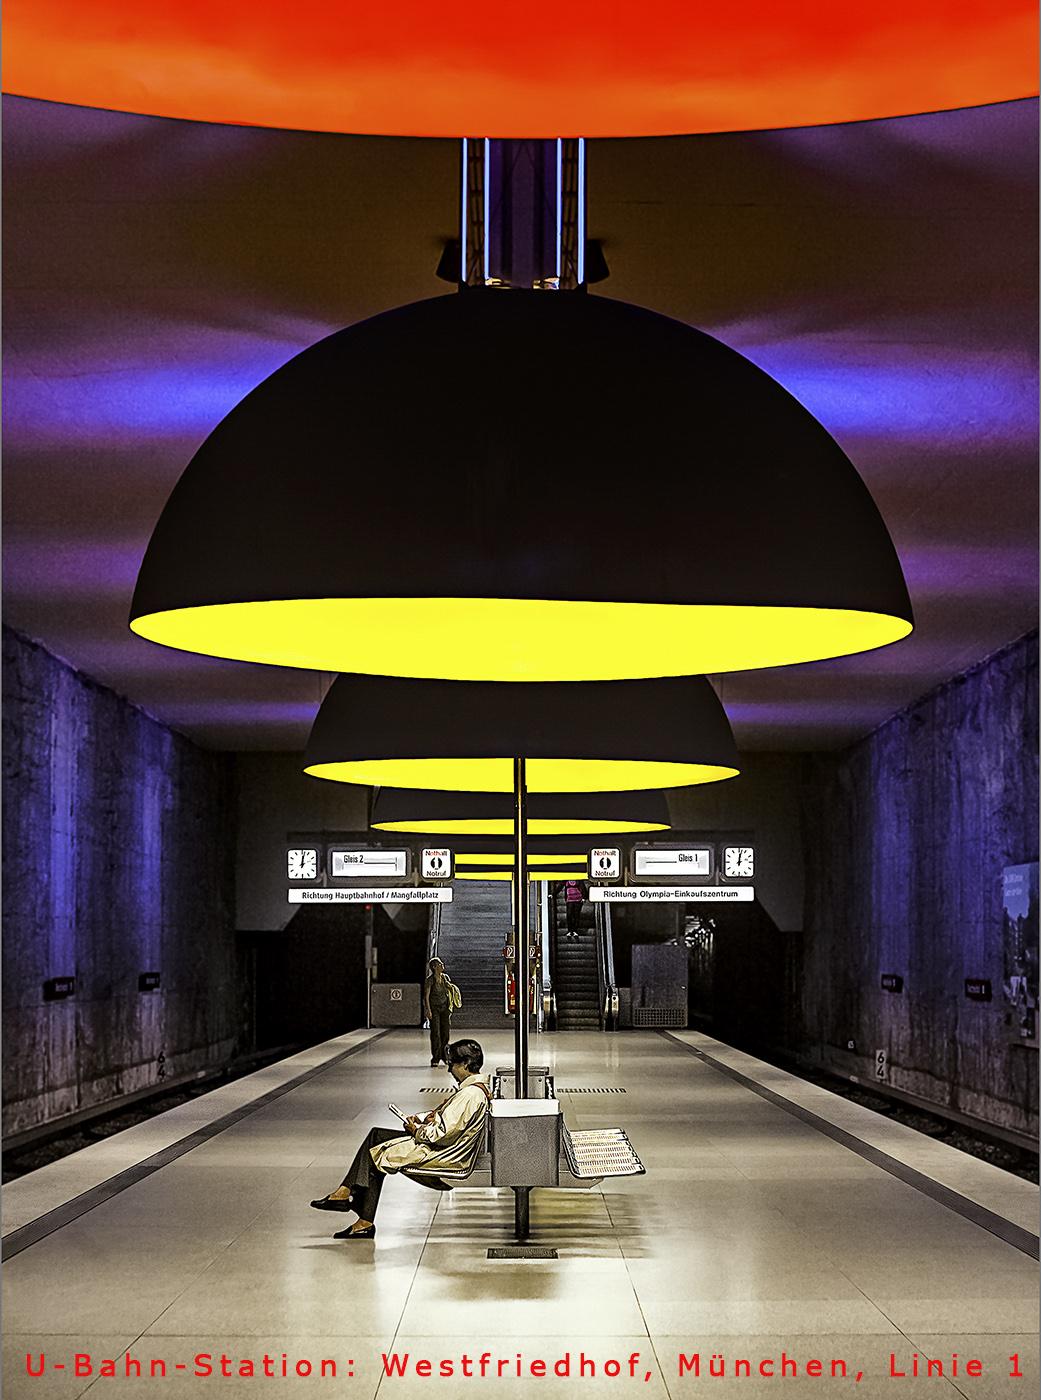 Modern Subway Station in Munich, Germany